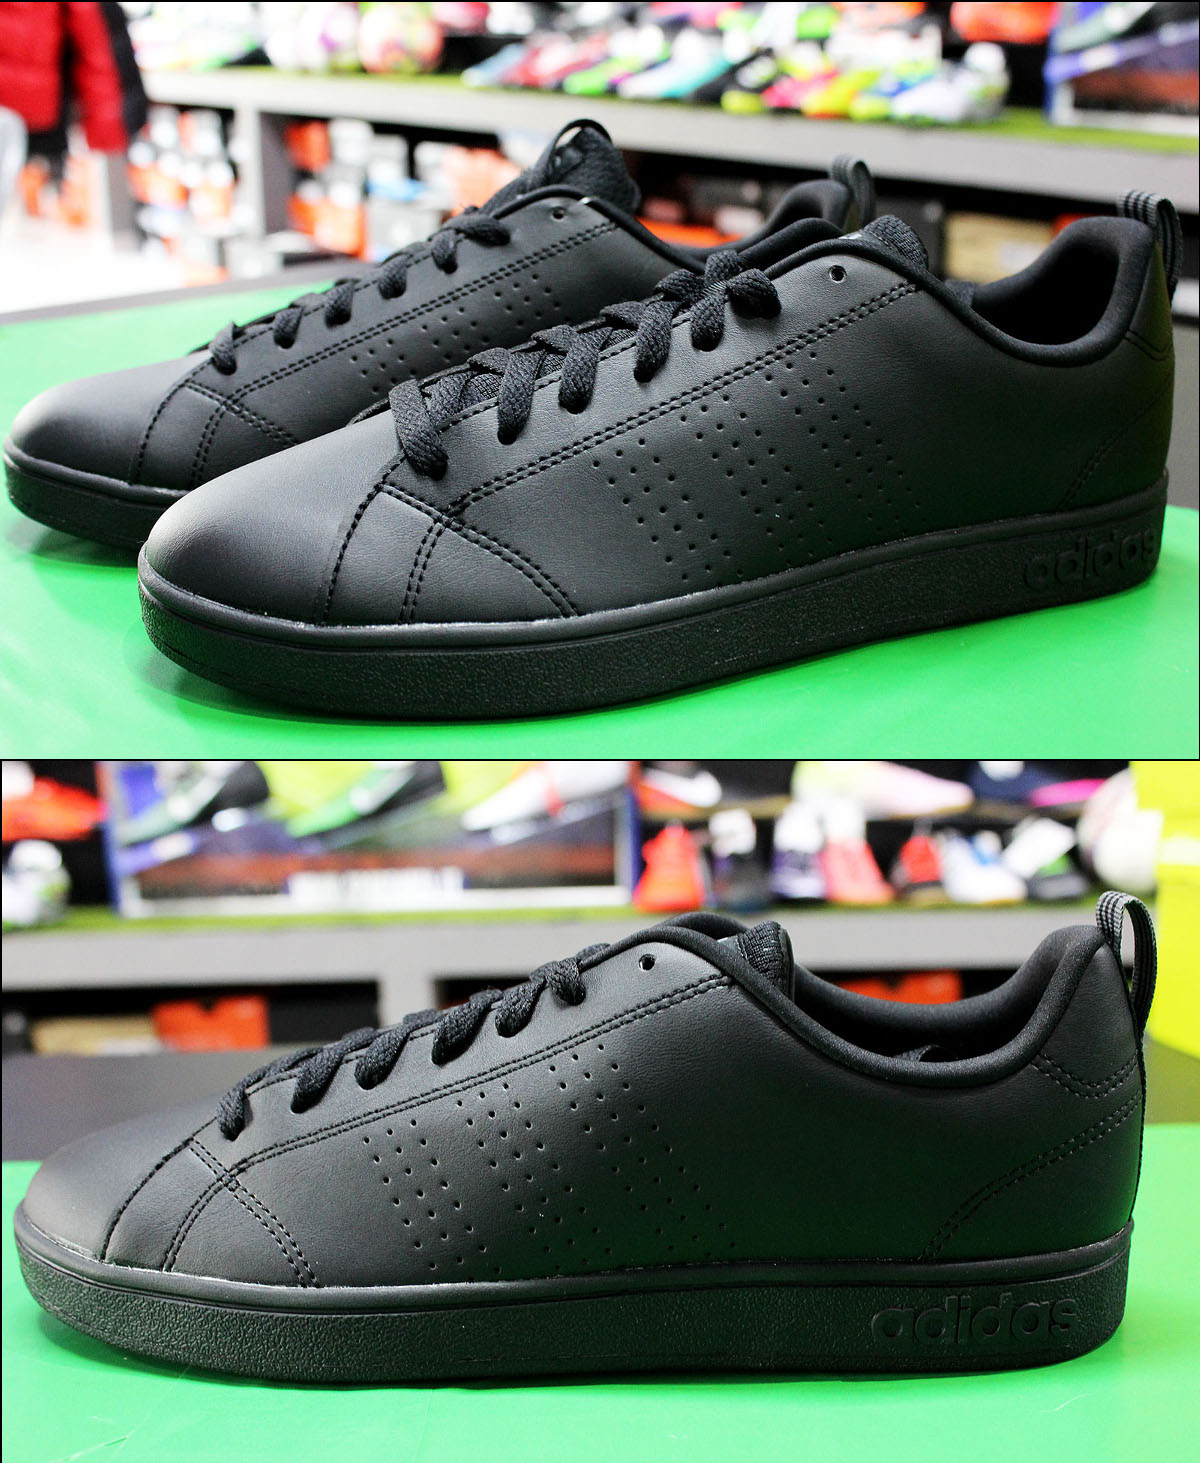 Adidas Scarpe Scarpe da Ginnastica  Sportive advantage Clean Nero    Ginnastica  58f187